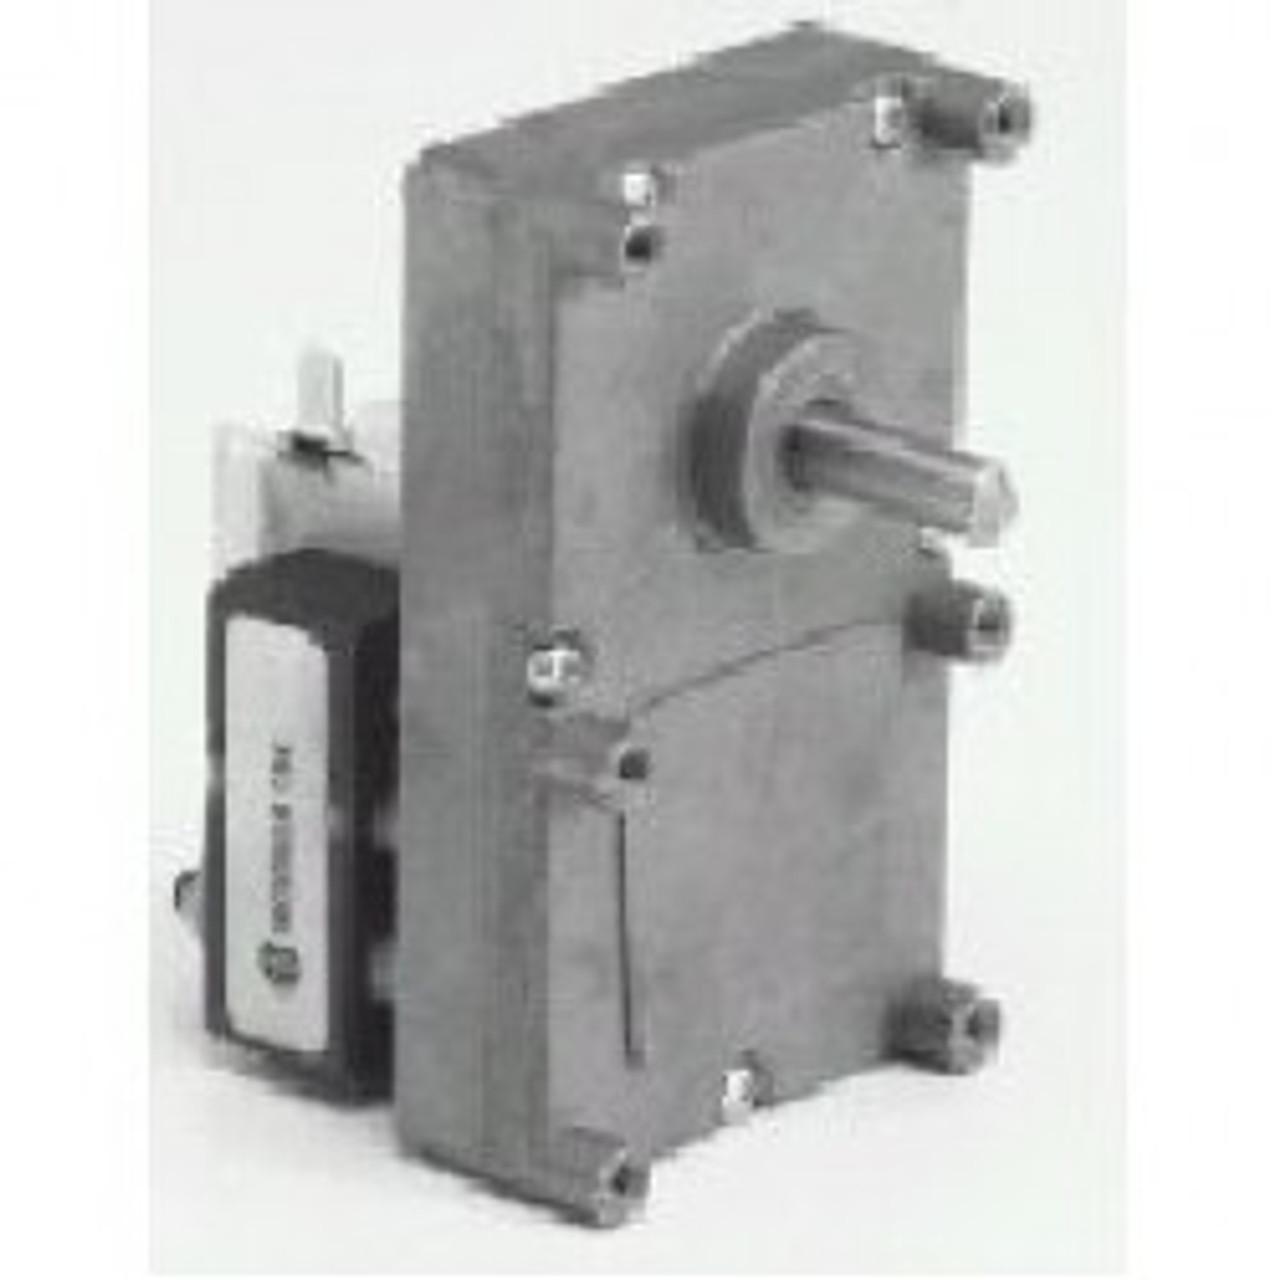 R7-RGM651 (HM-RGM651)Whitfield Quest 5.5 RPM, 1/2 in. shaft, Aug